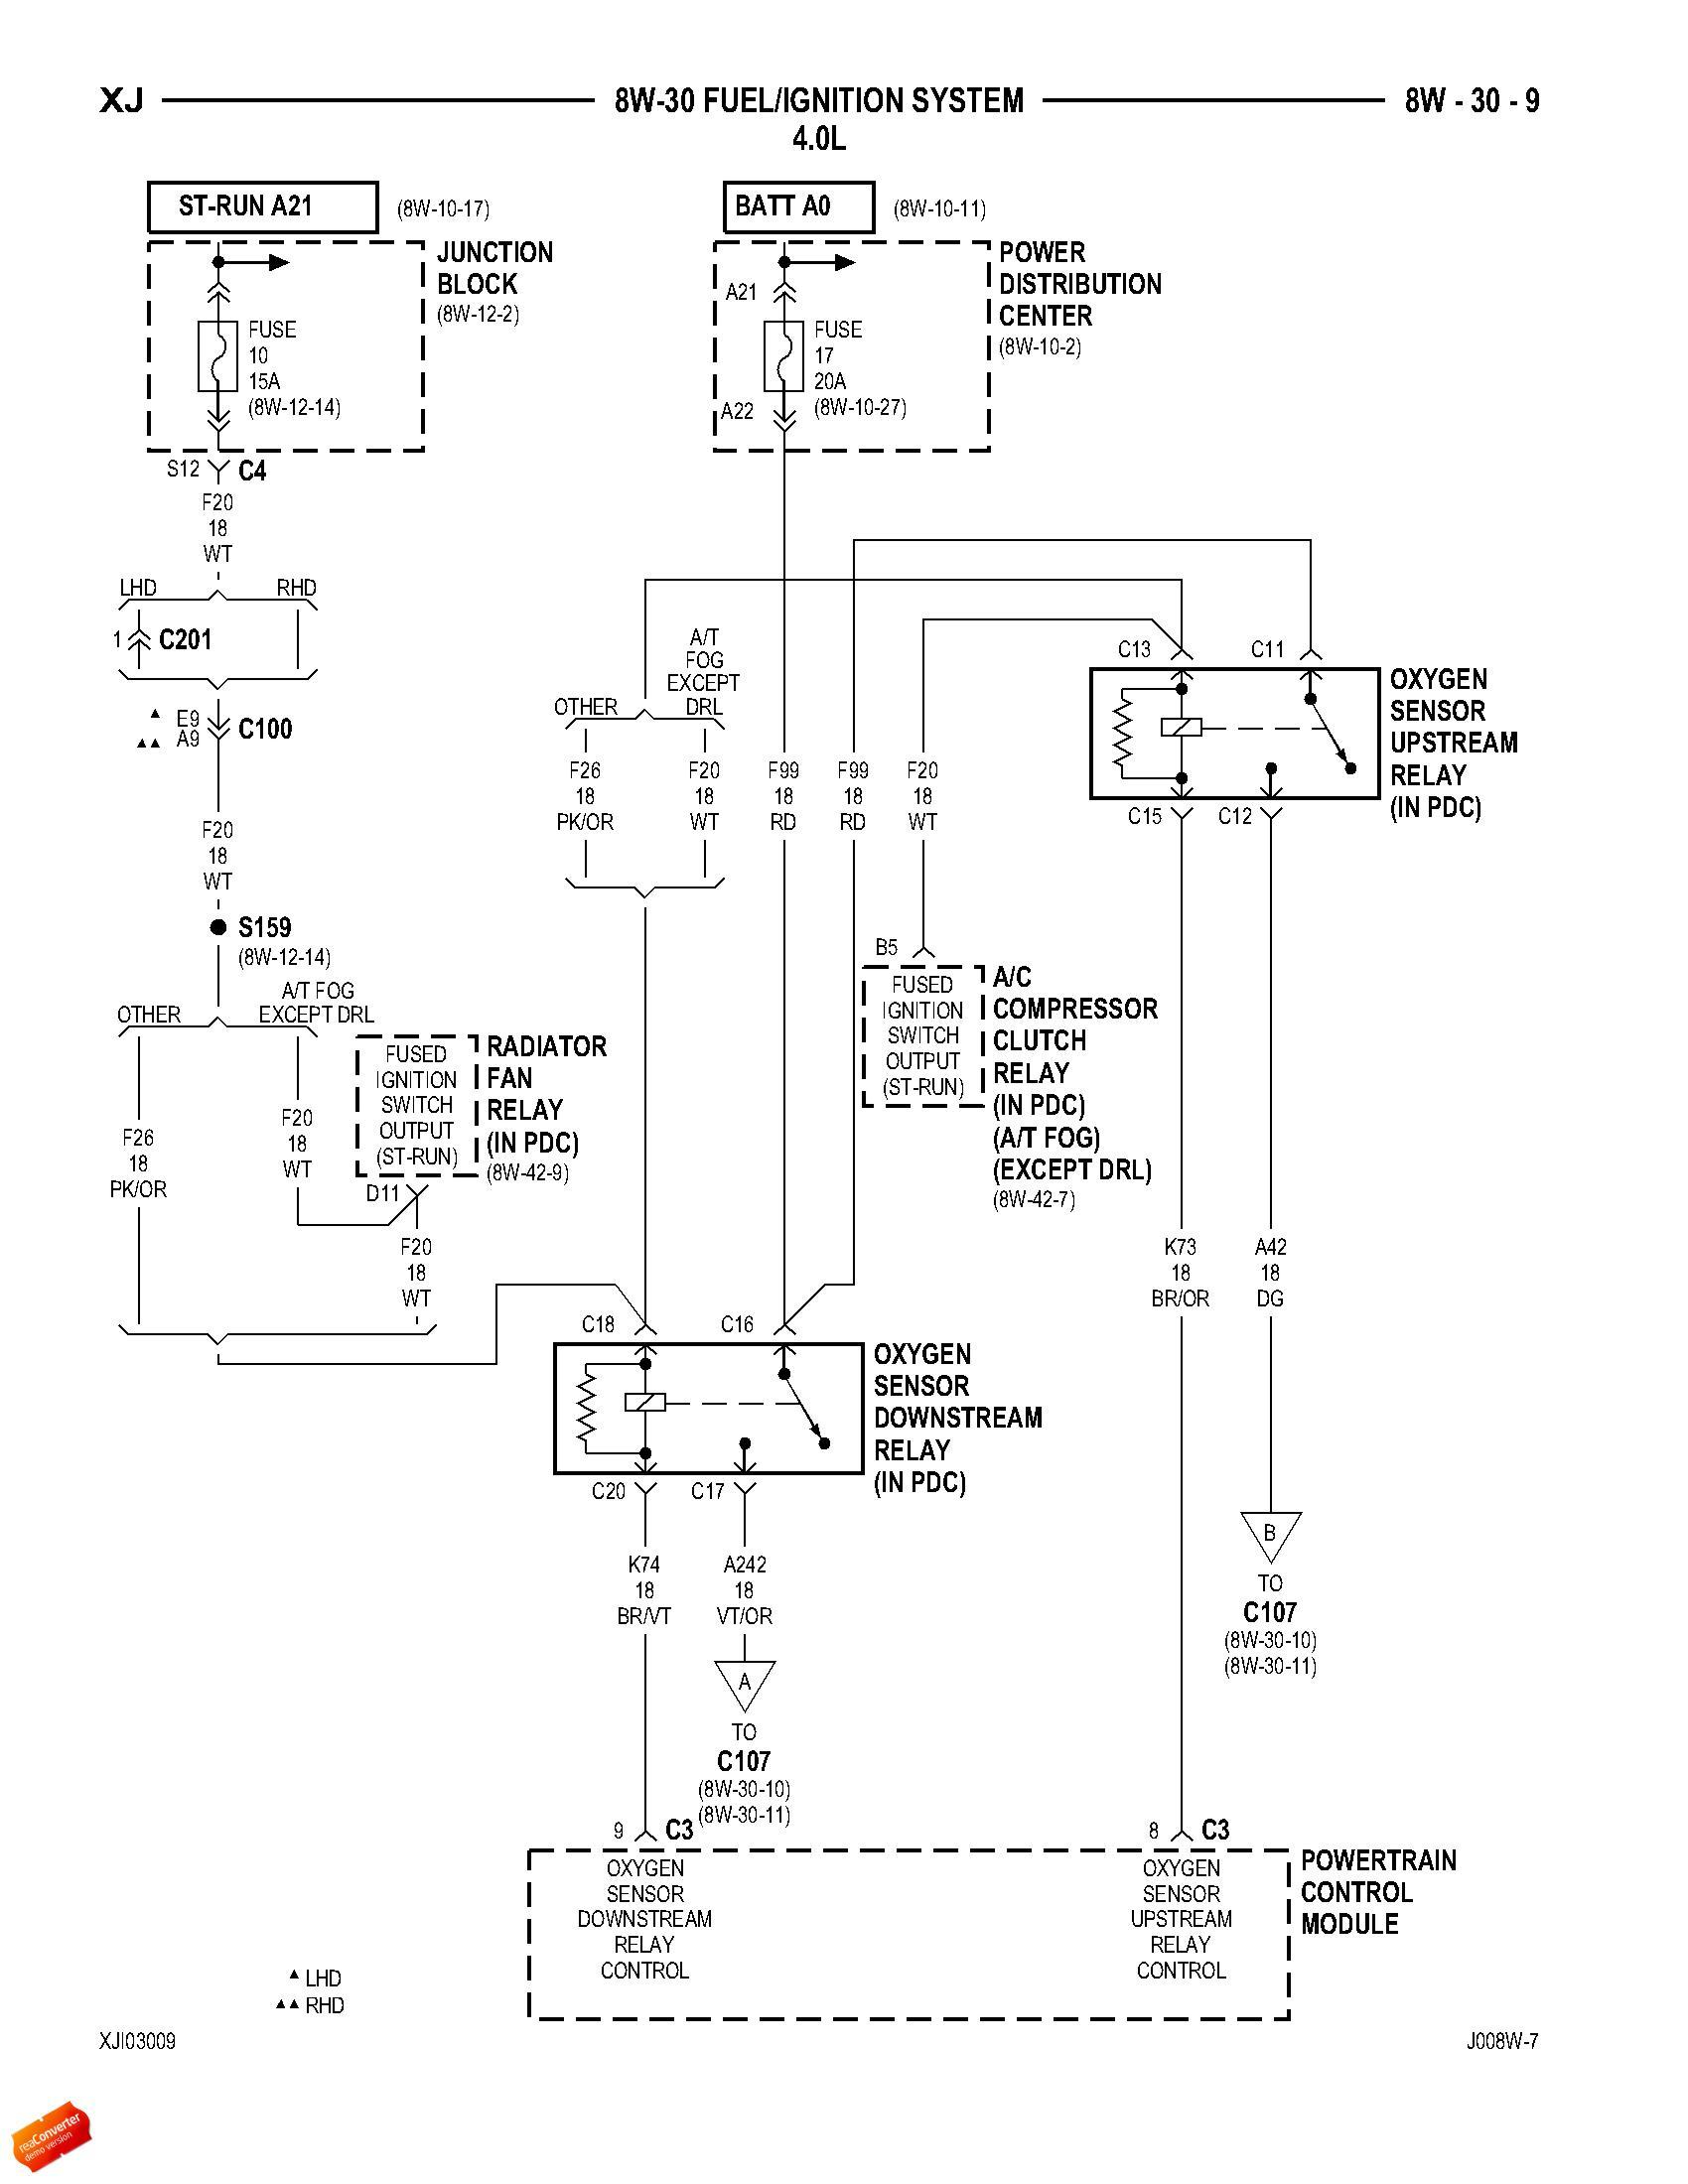 2000 jeep grand cherokee oxygen sensor wiring diagram